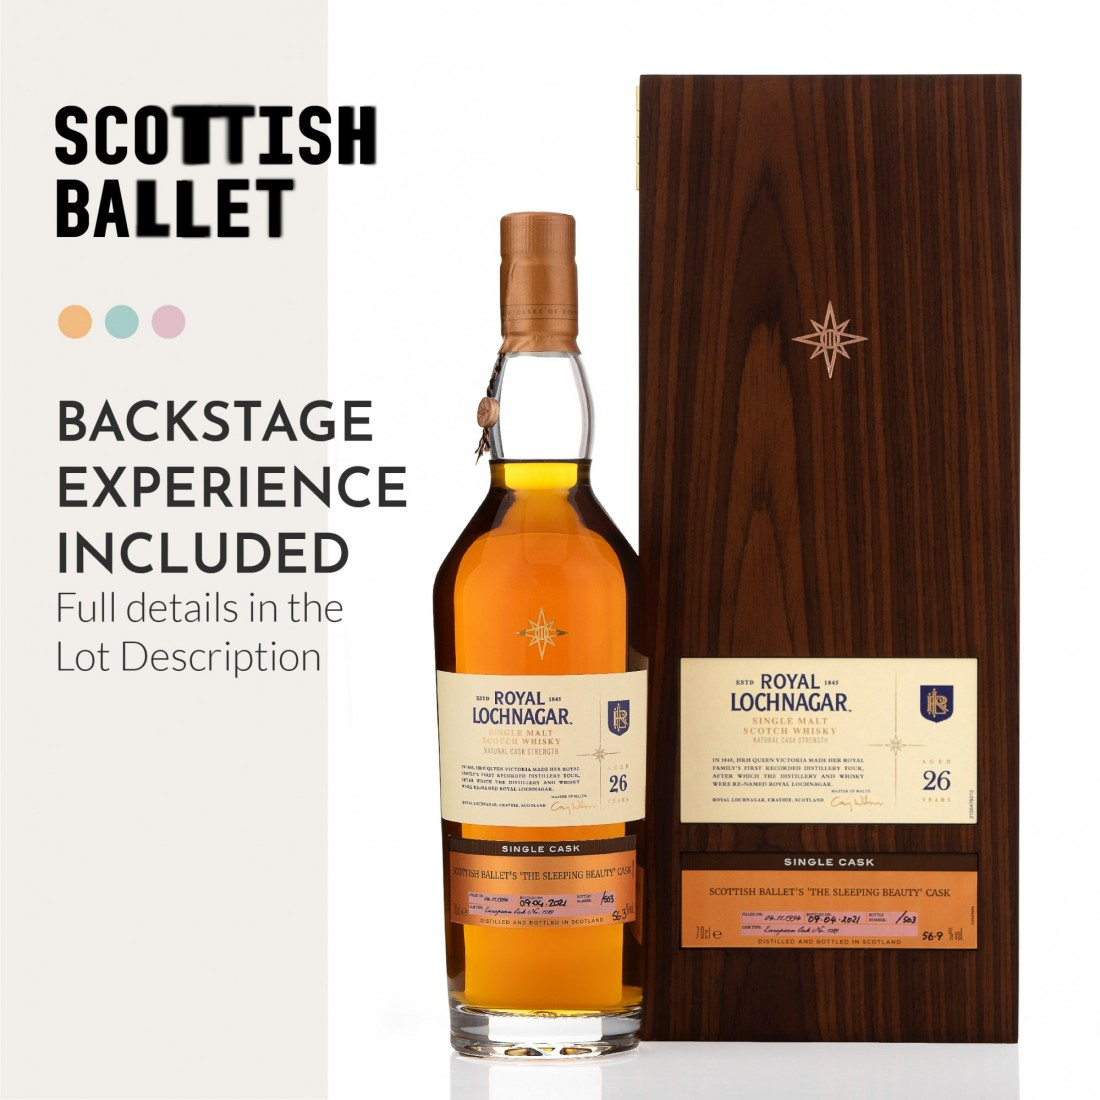 Royal Lochnagar 1994 Casks of Distinction 26 Year Old #1289 / Bottle #009